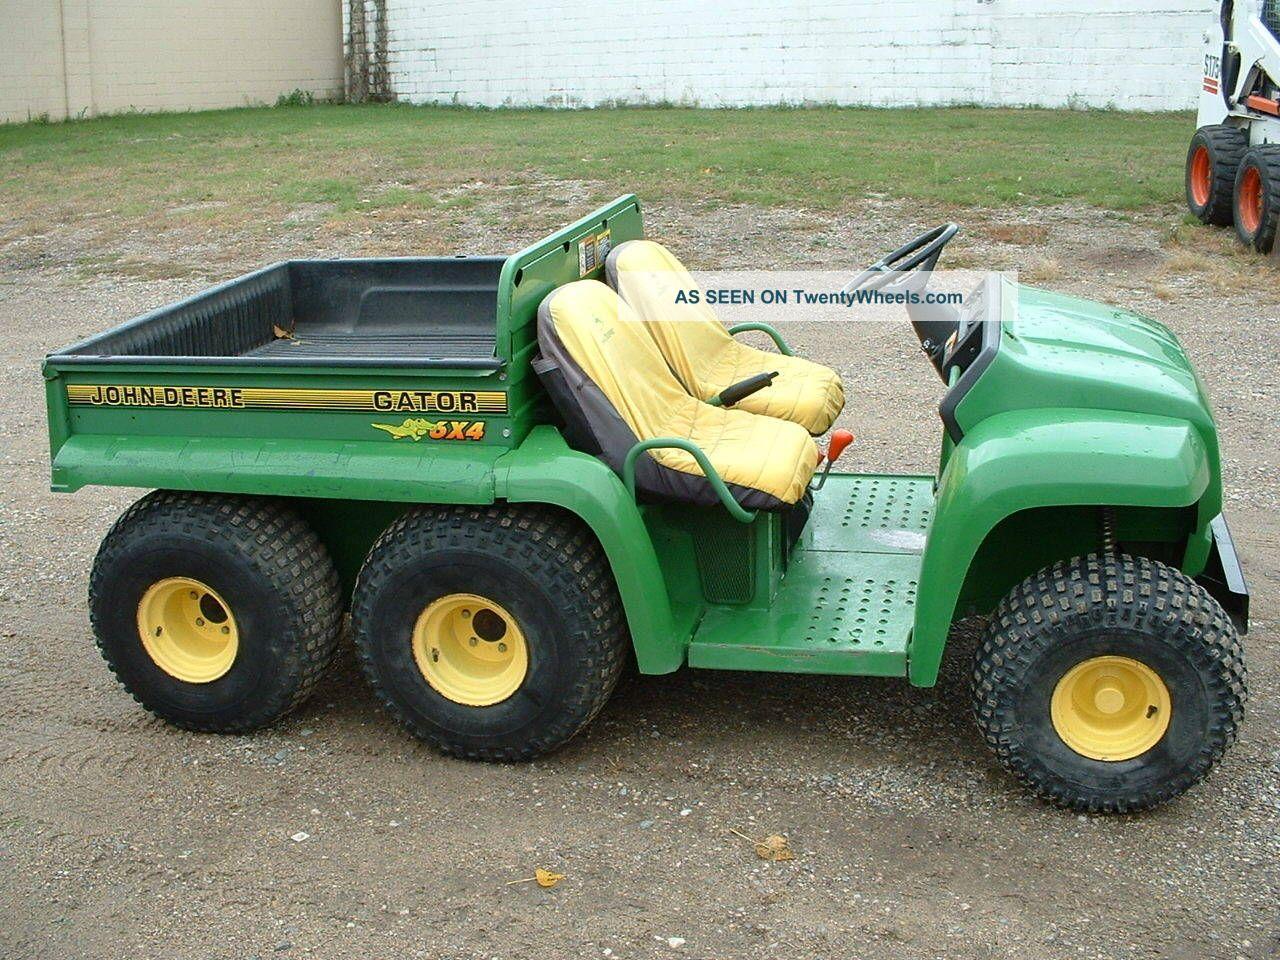 john deere utility vehicle john deere u e